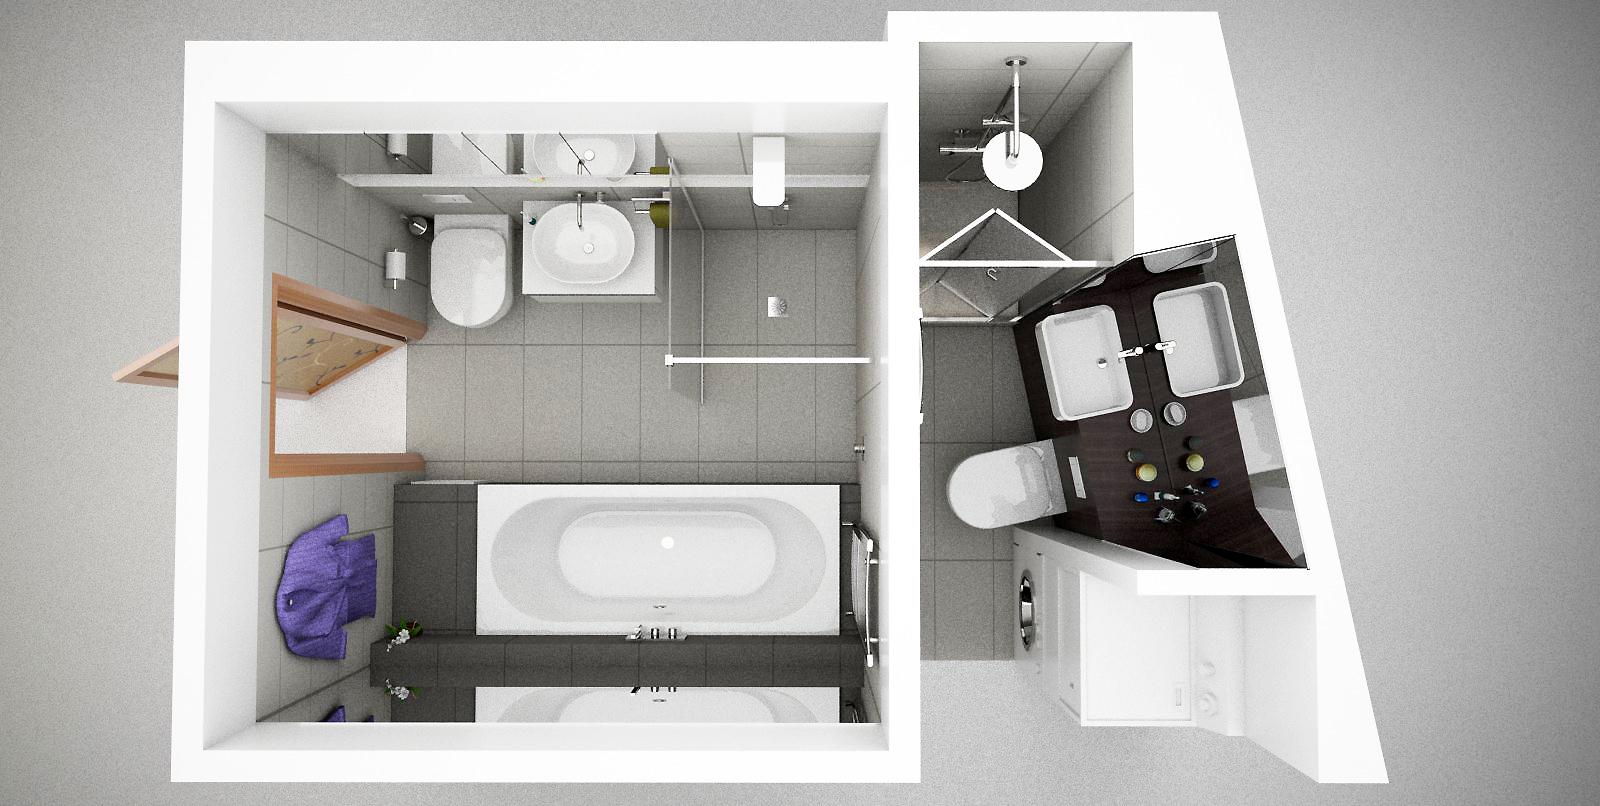 Homebase Kitchen Planning Tool